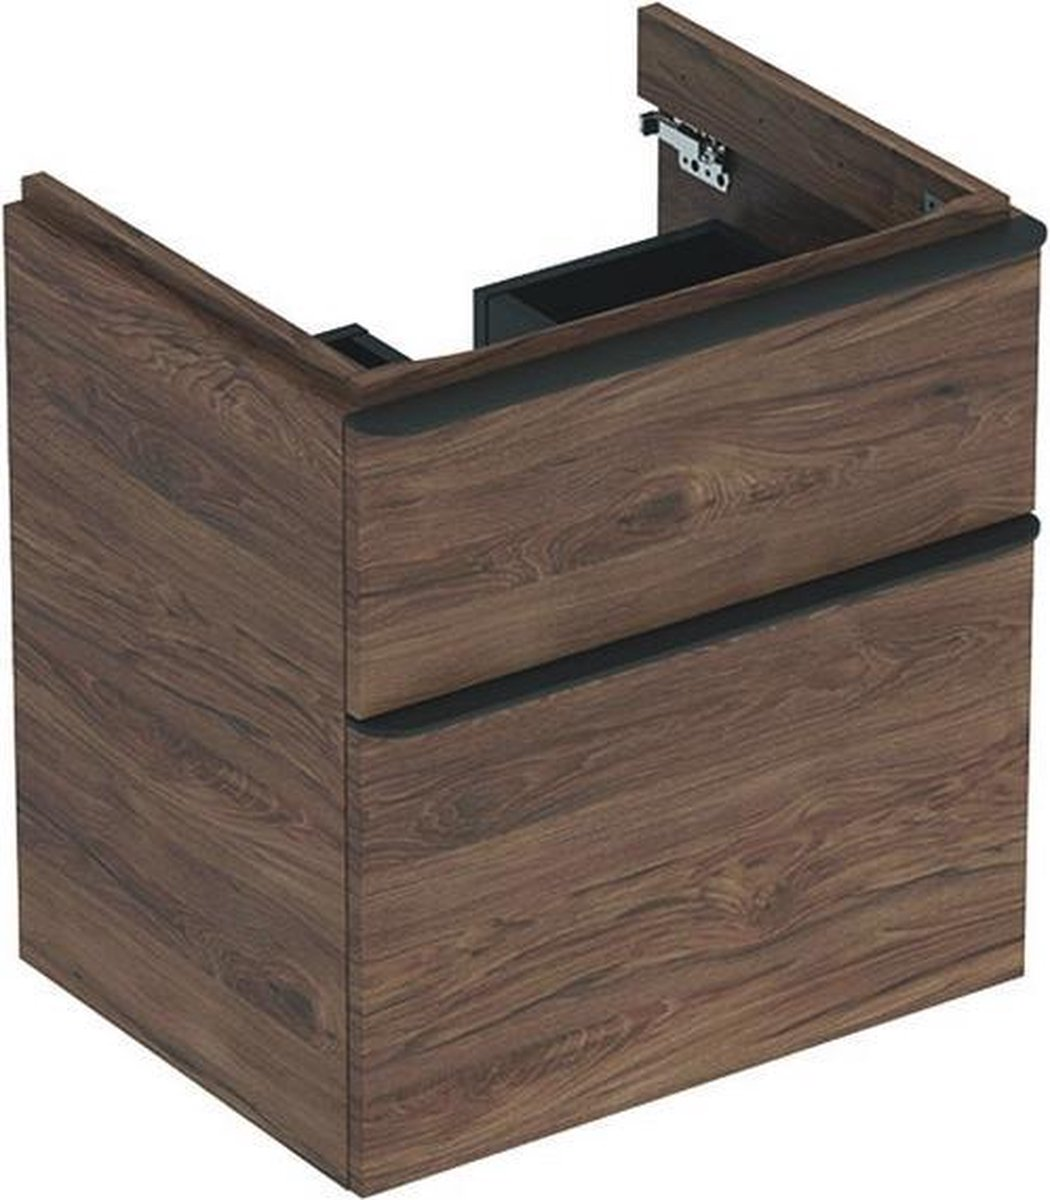 Geberit Smyle wastafelonderkast 2 laden 58,5x62 cm, noten hickory